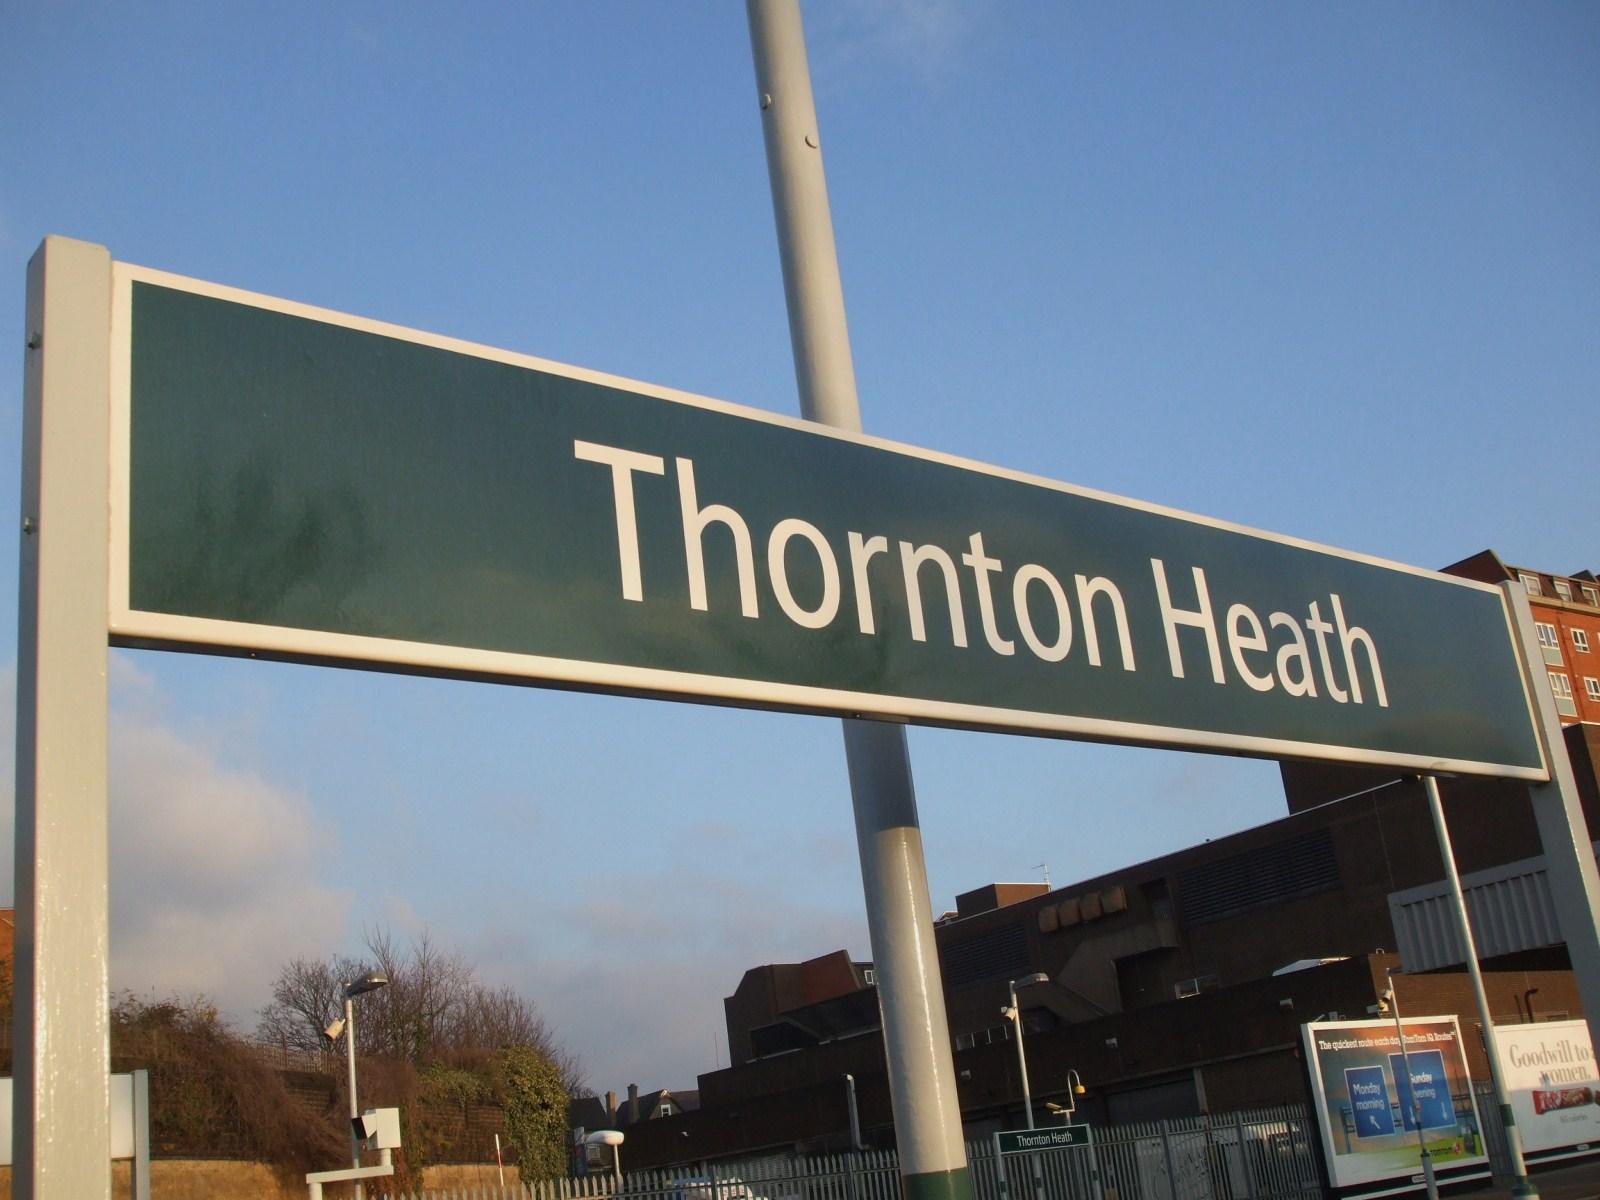 Tobin Heath s Net worth and Salary